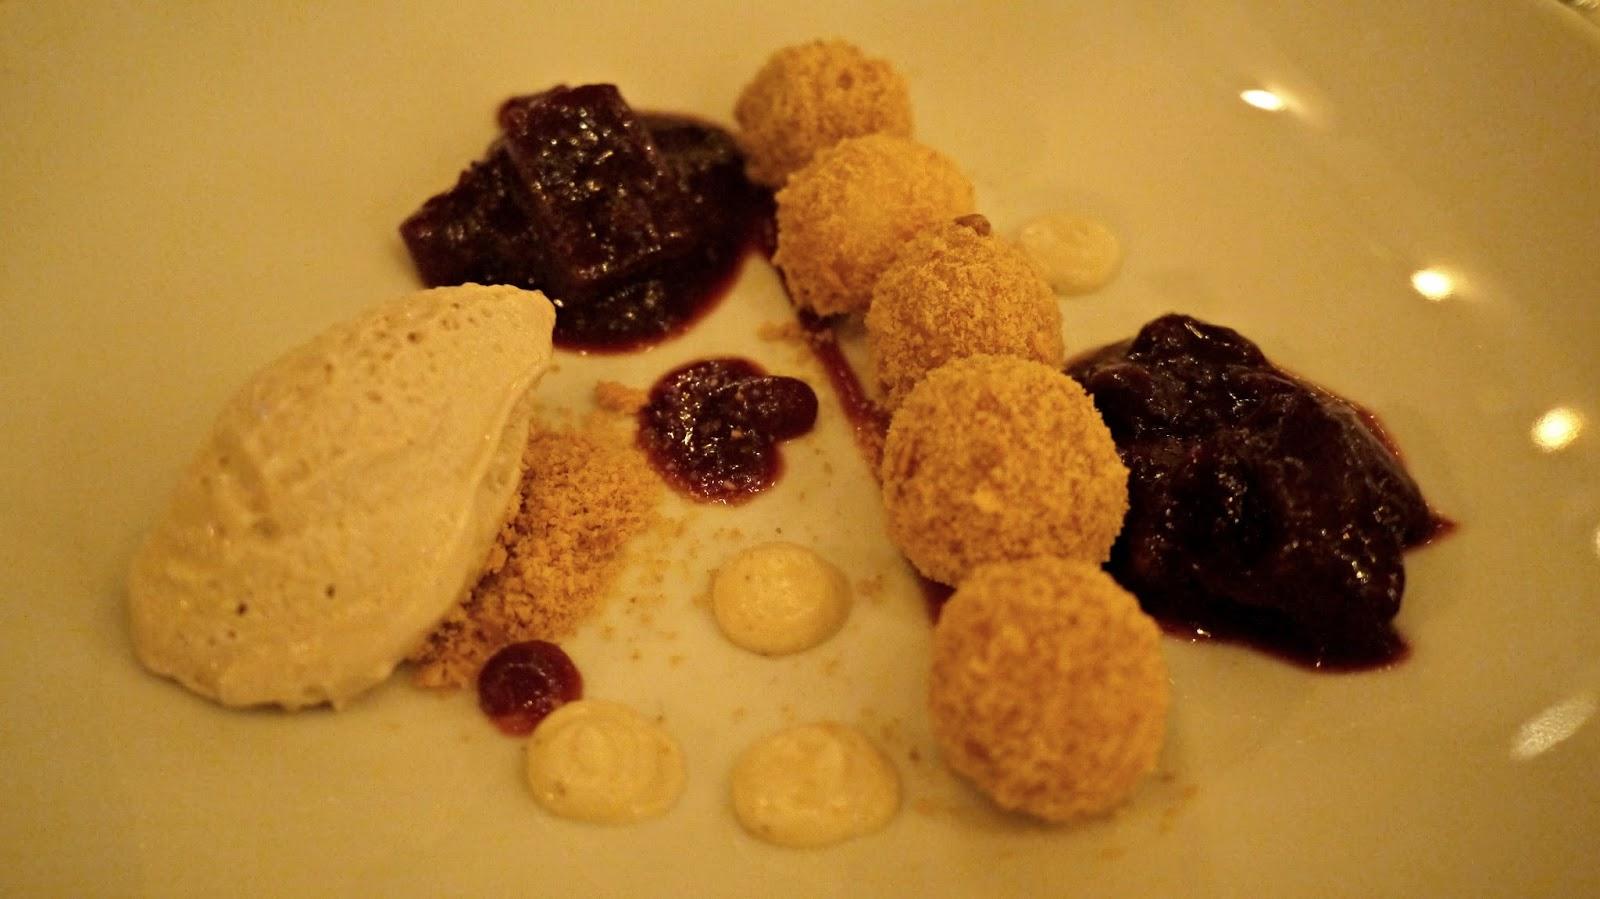 Aszú Étterem restaurant budapest plum dumplings